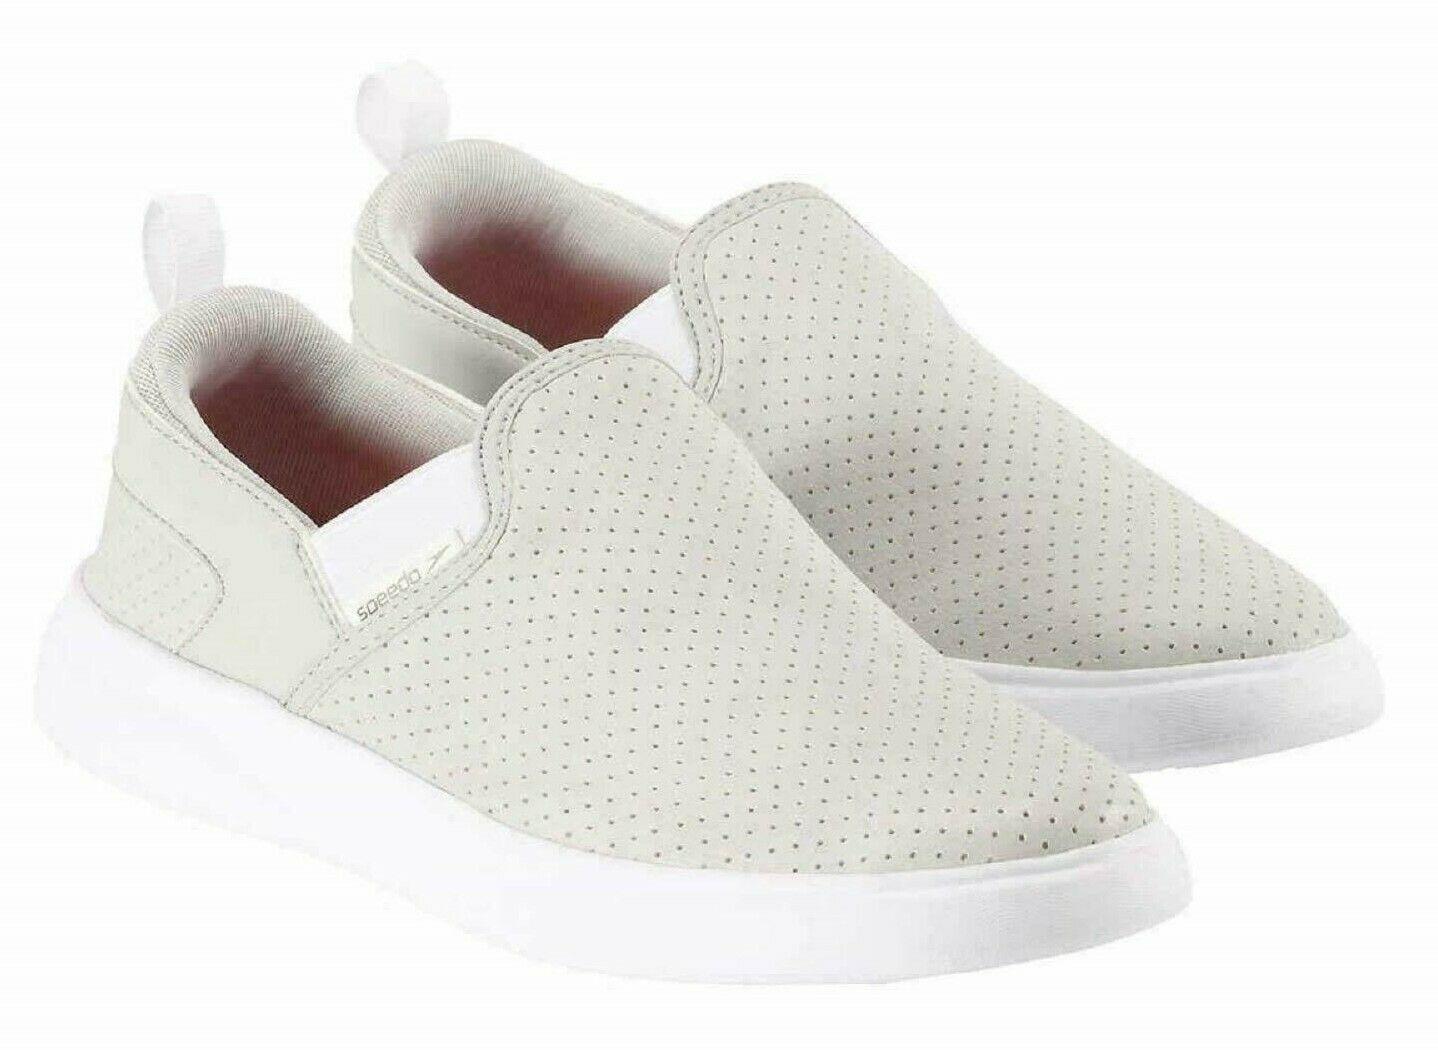 Speedo Women's Grey Light Weight Ladies' Hybrid Slip on Sneaker Boat Water Shoes